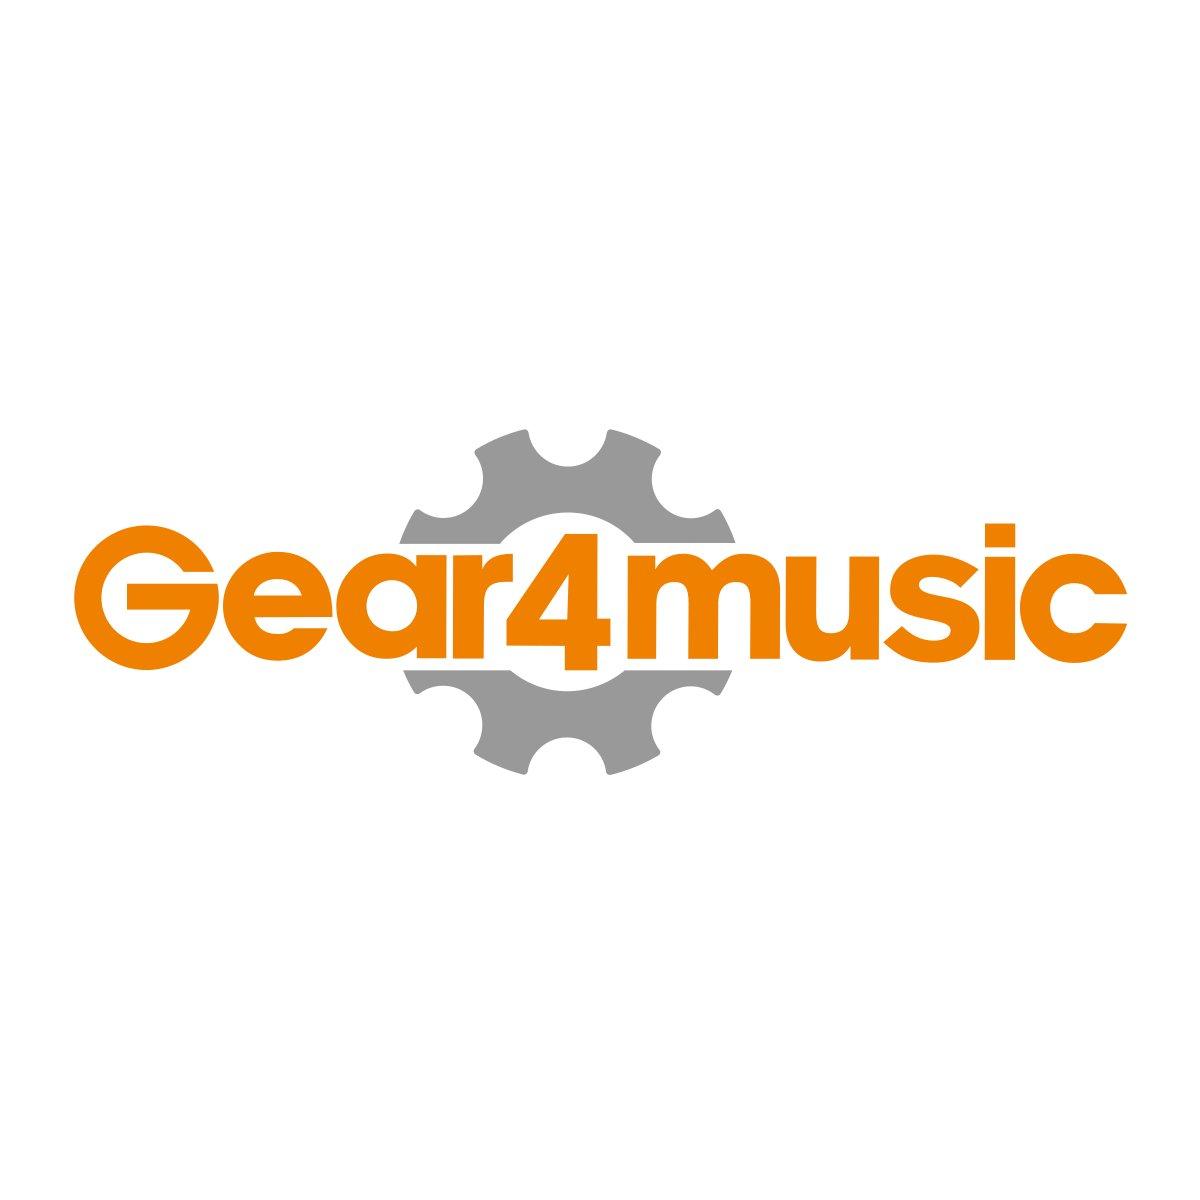 MK-7000 Keyboard with USB by Gear4music